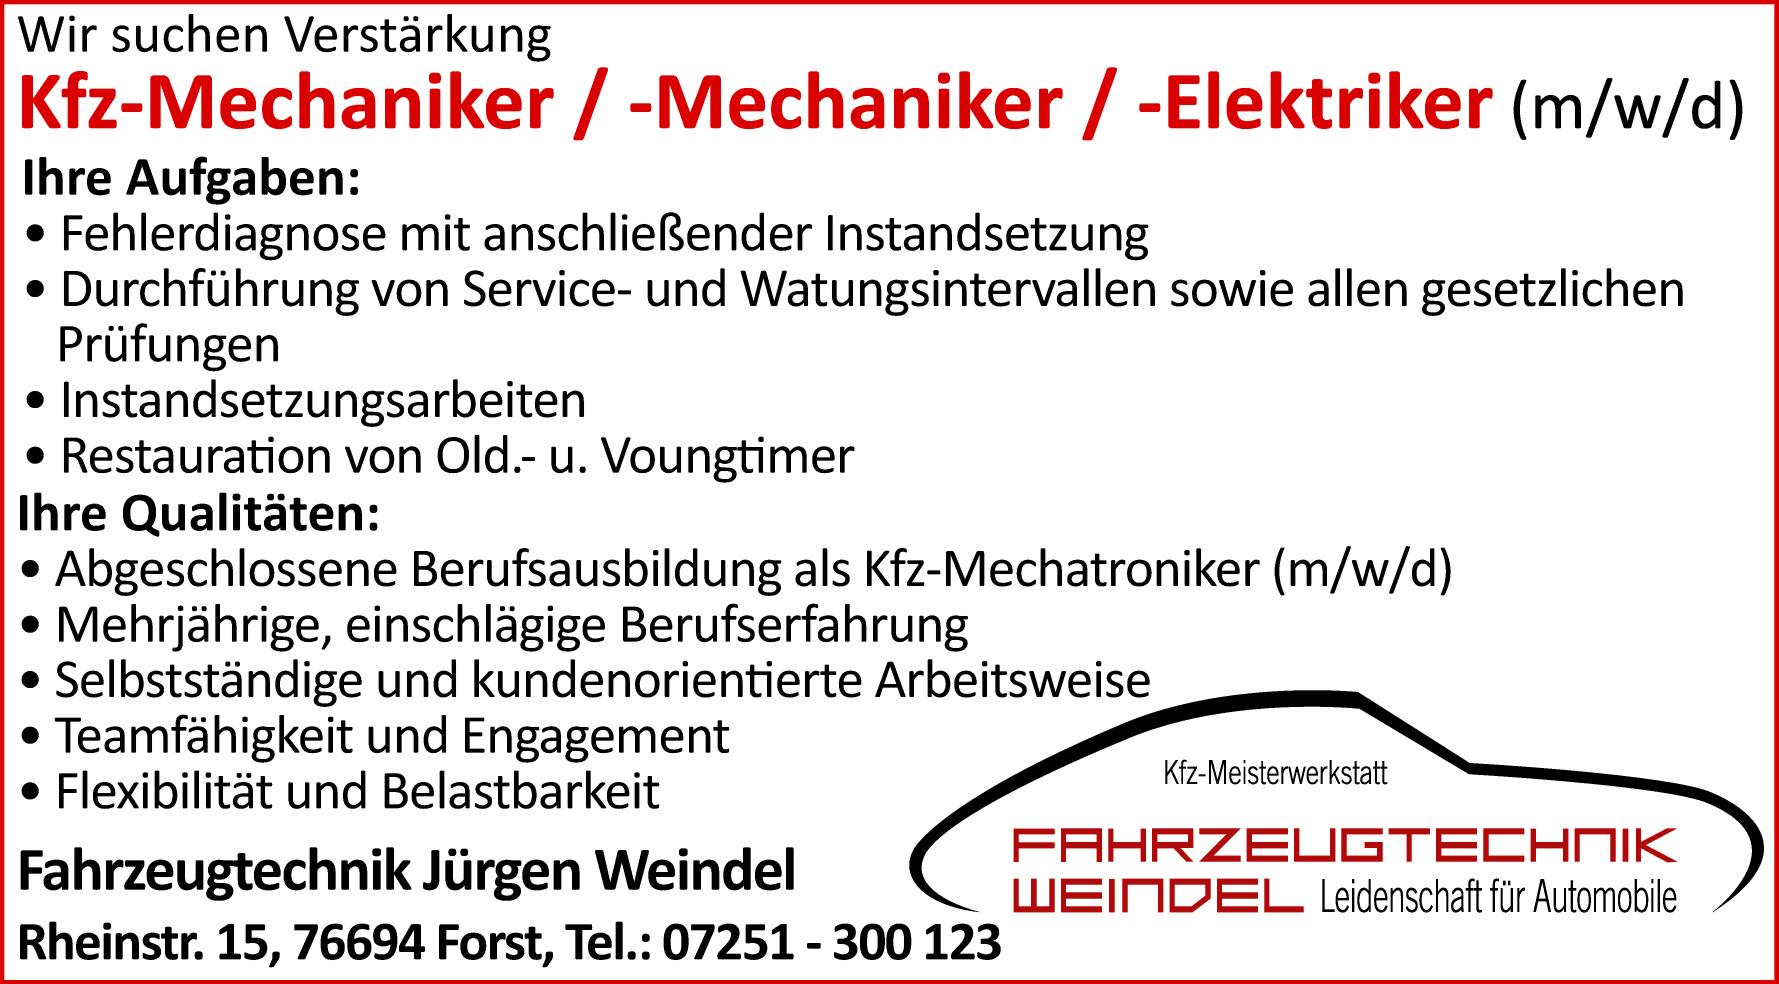 Fahrzeugtechnik Weindel